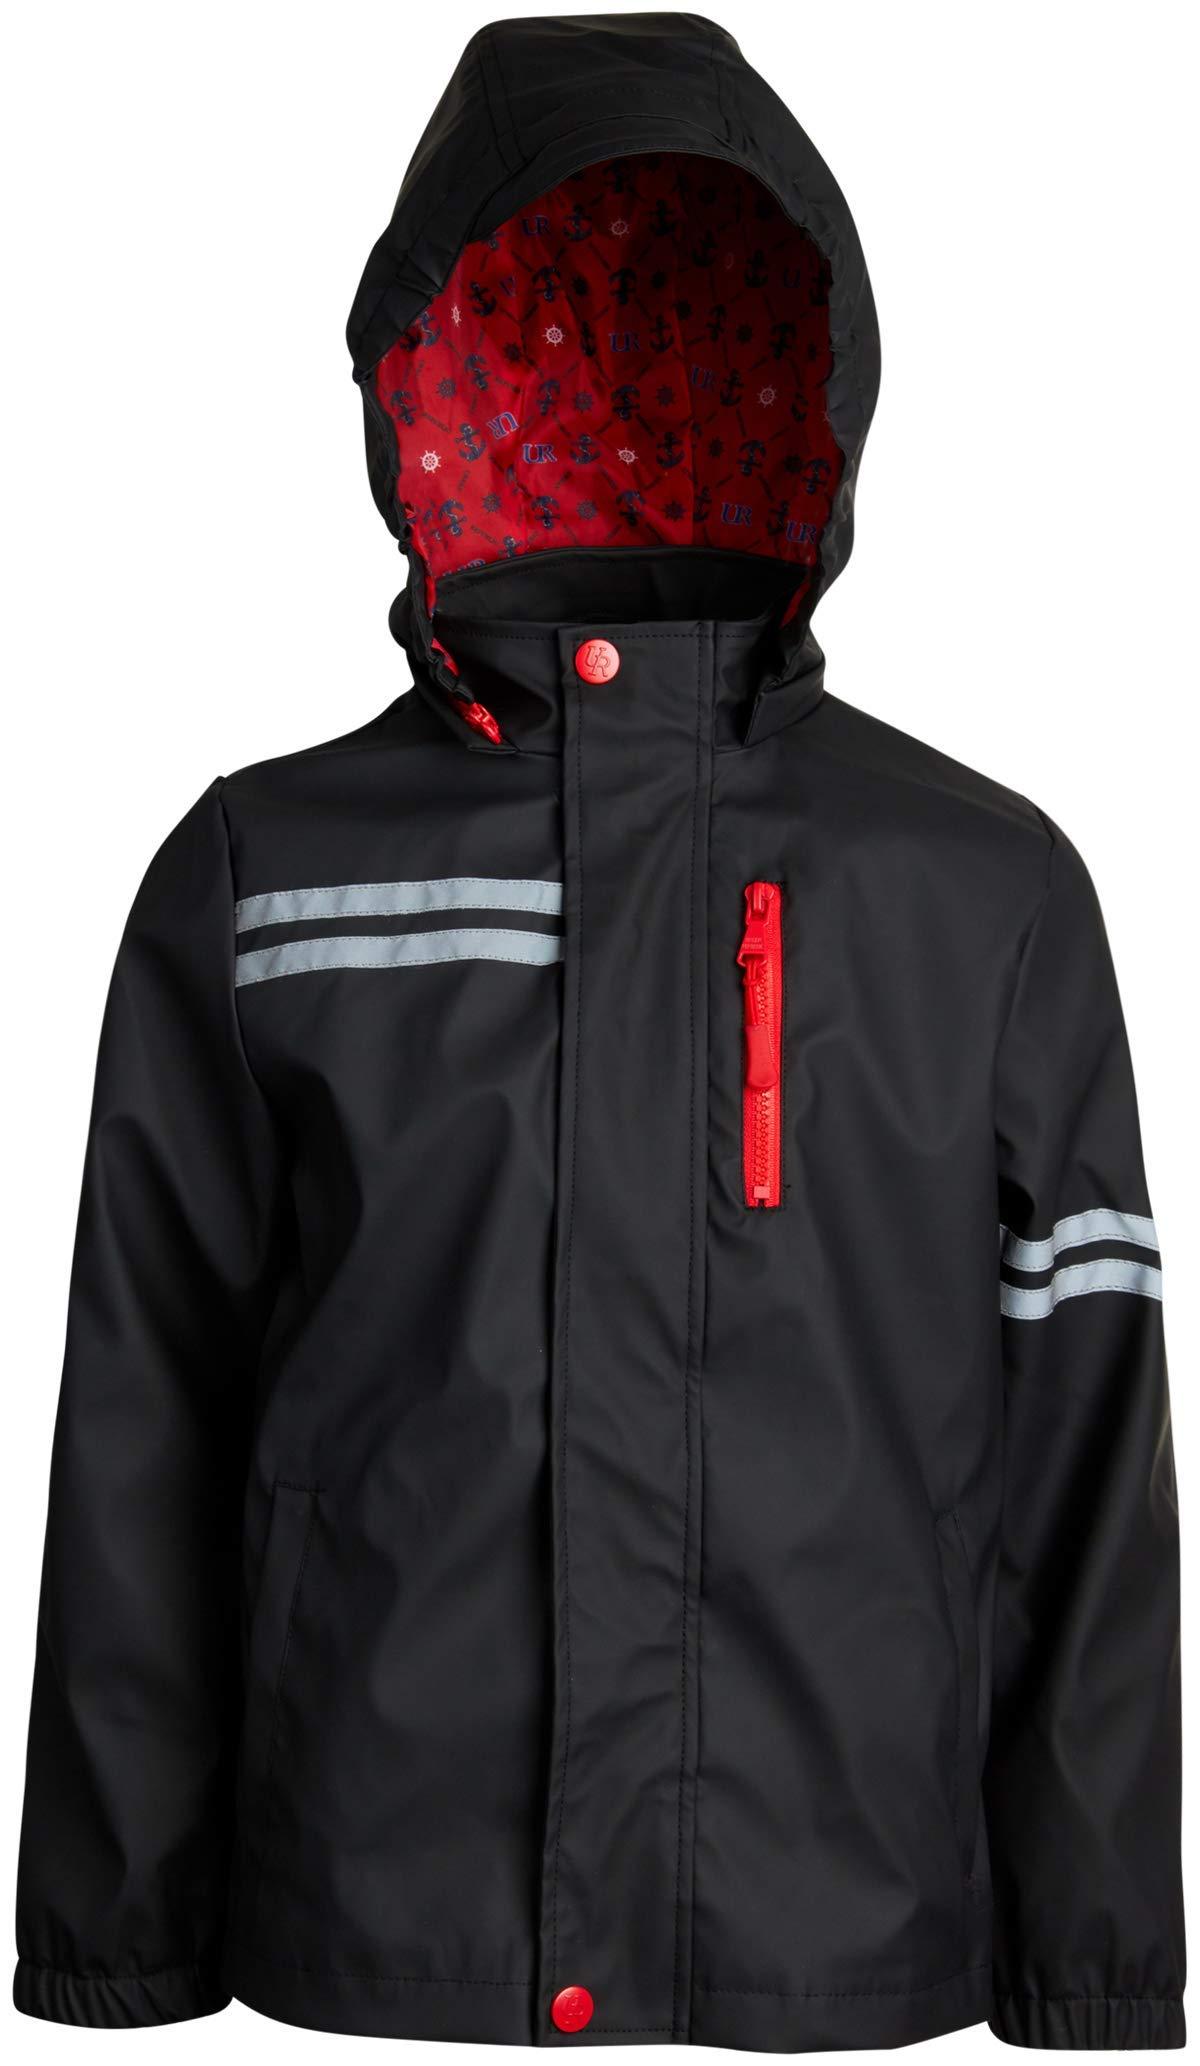 Urban Republic Boys Lightweight Waterproof Hooded Vinyl Raincoat Jacket, Black, Size 10/12'